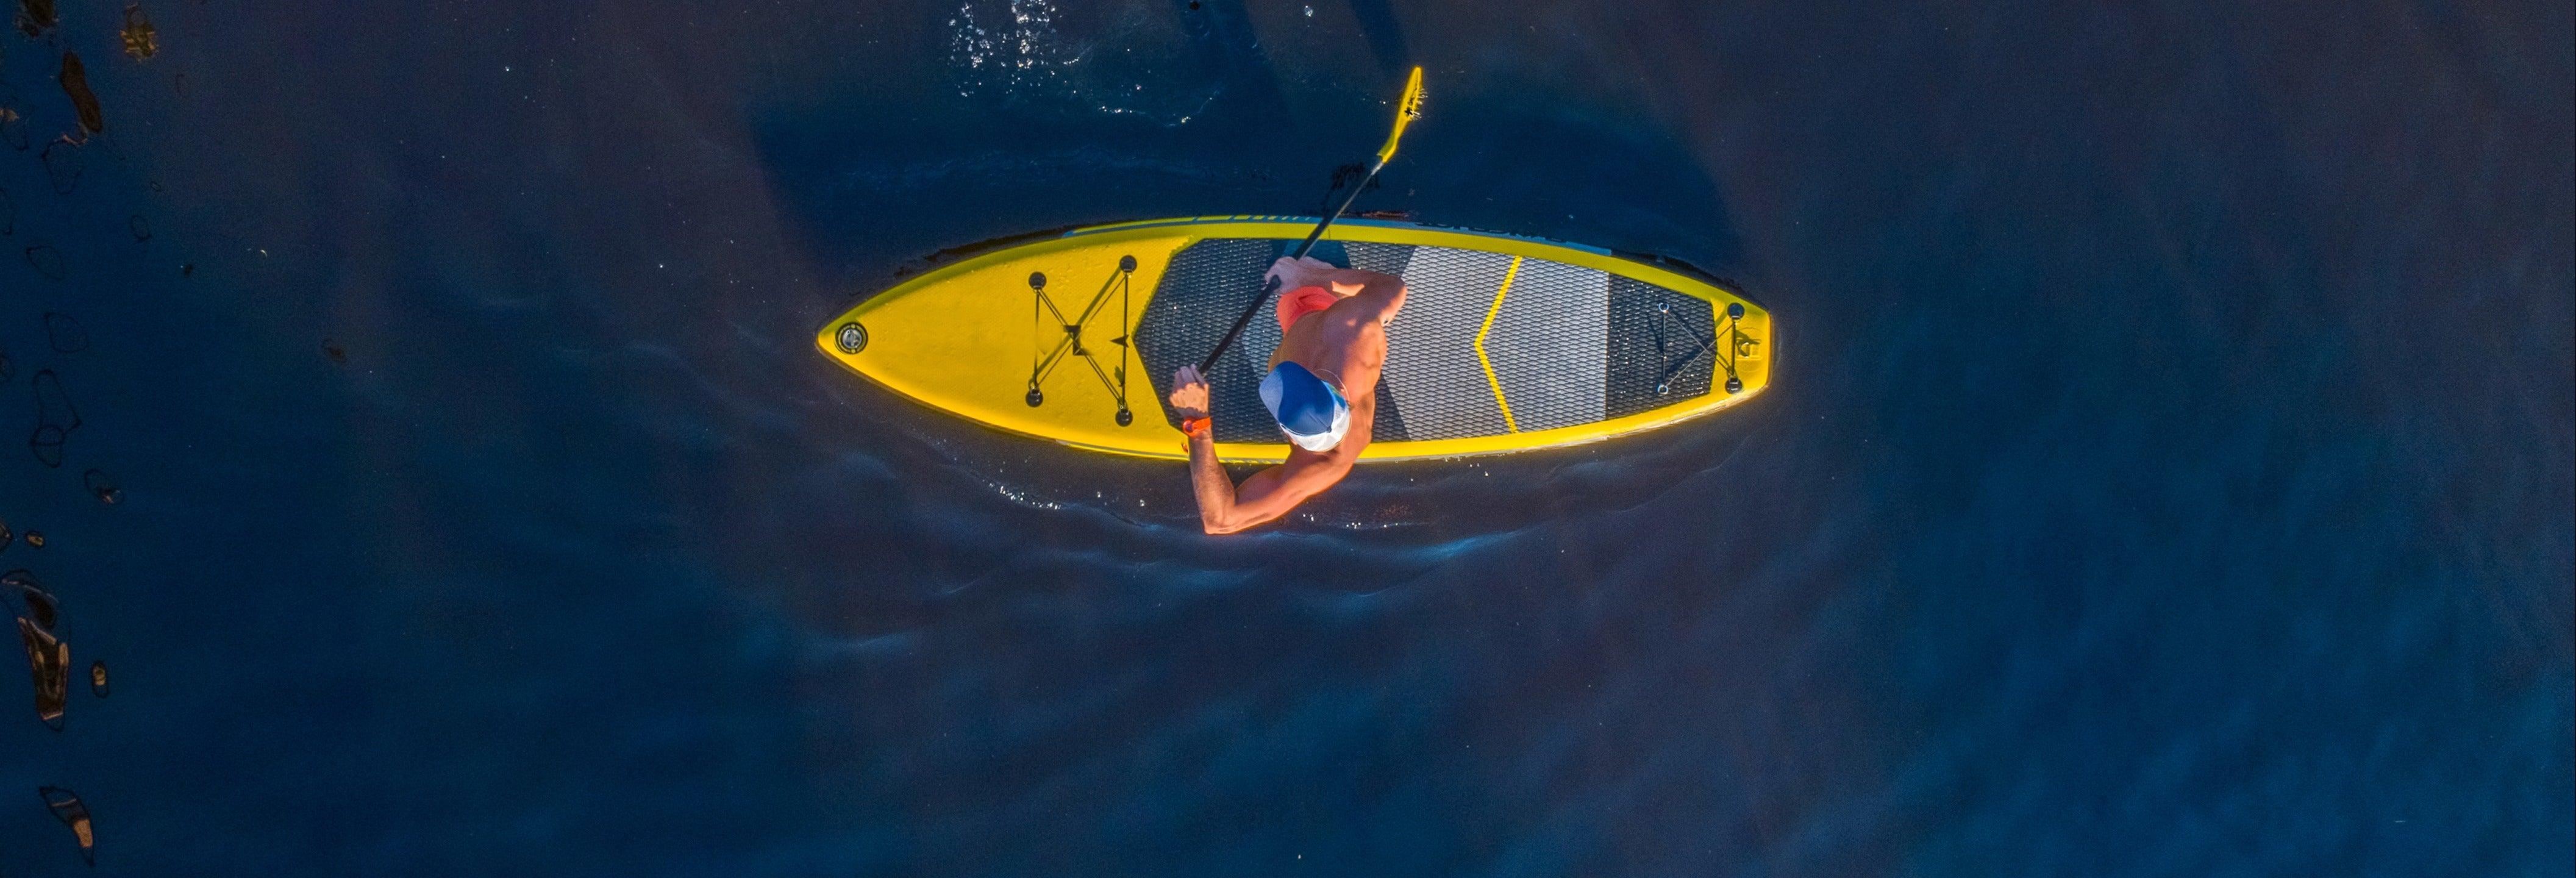 Alquiler de equipo de paddle surf en Playa Santiago